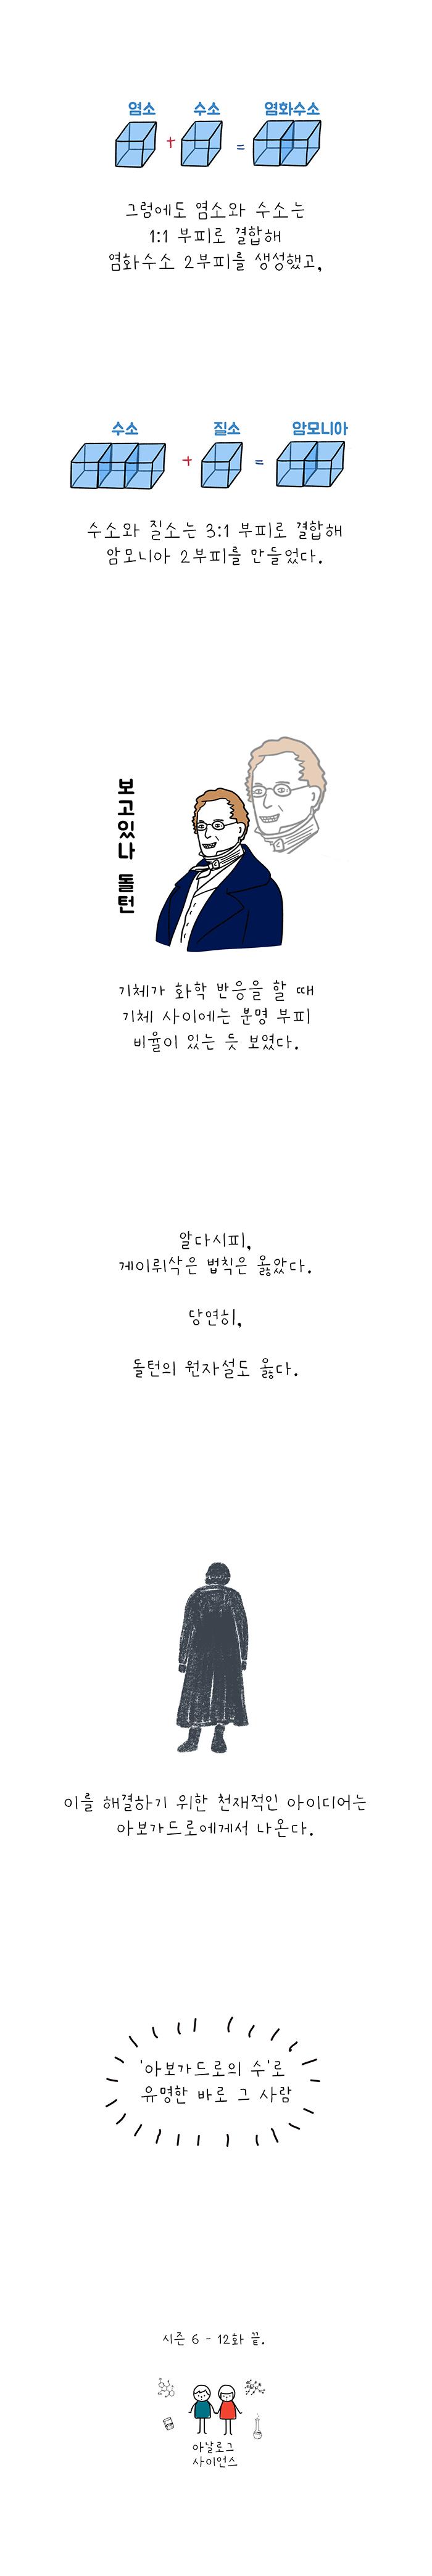 AS_6_12_04